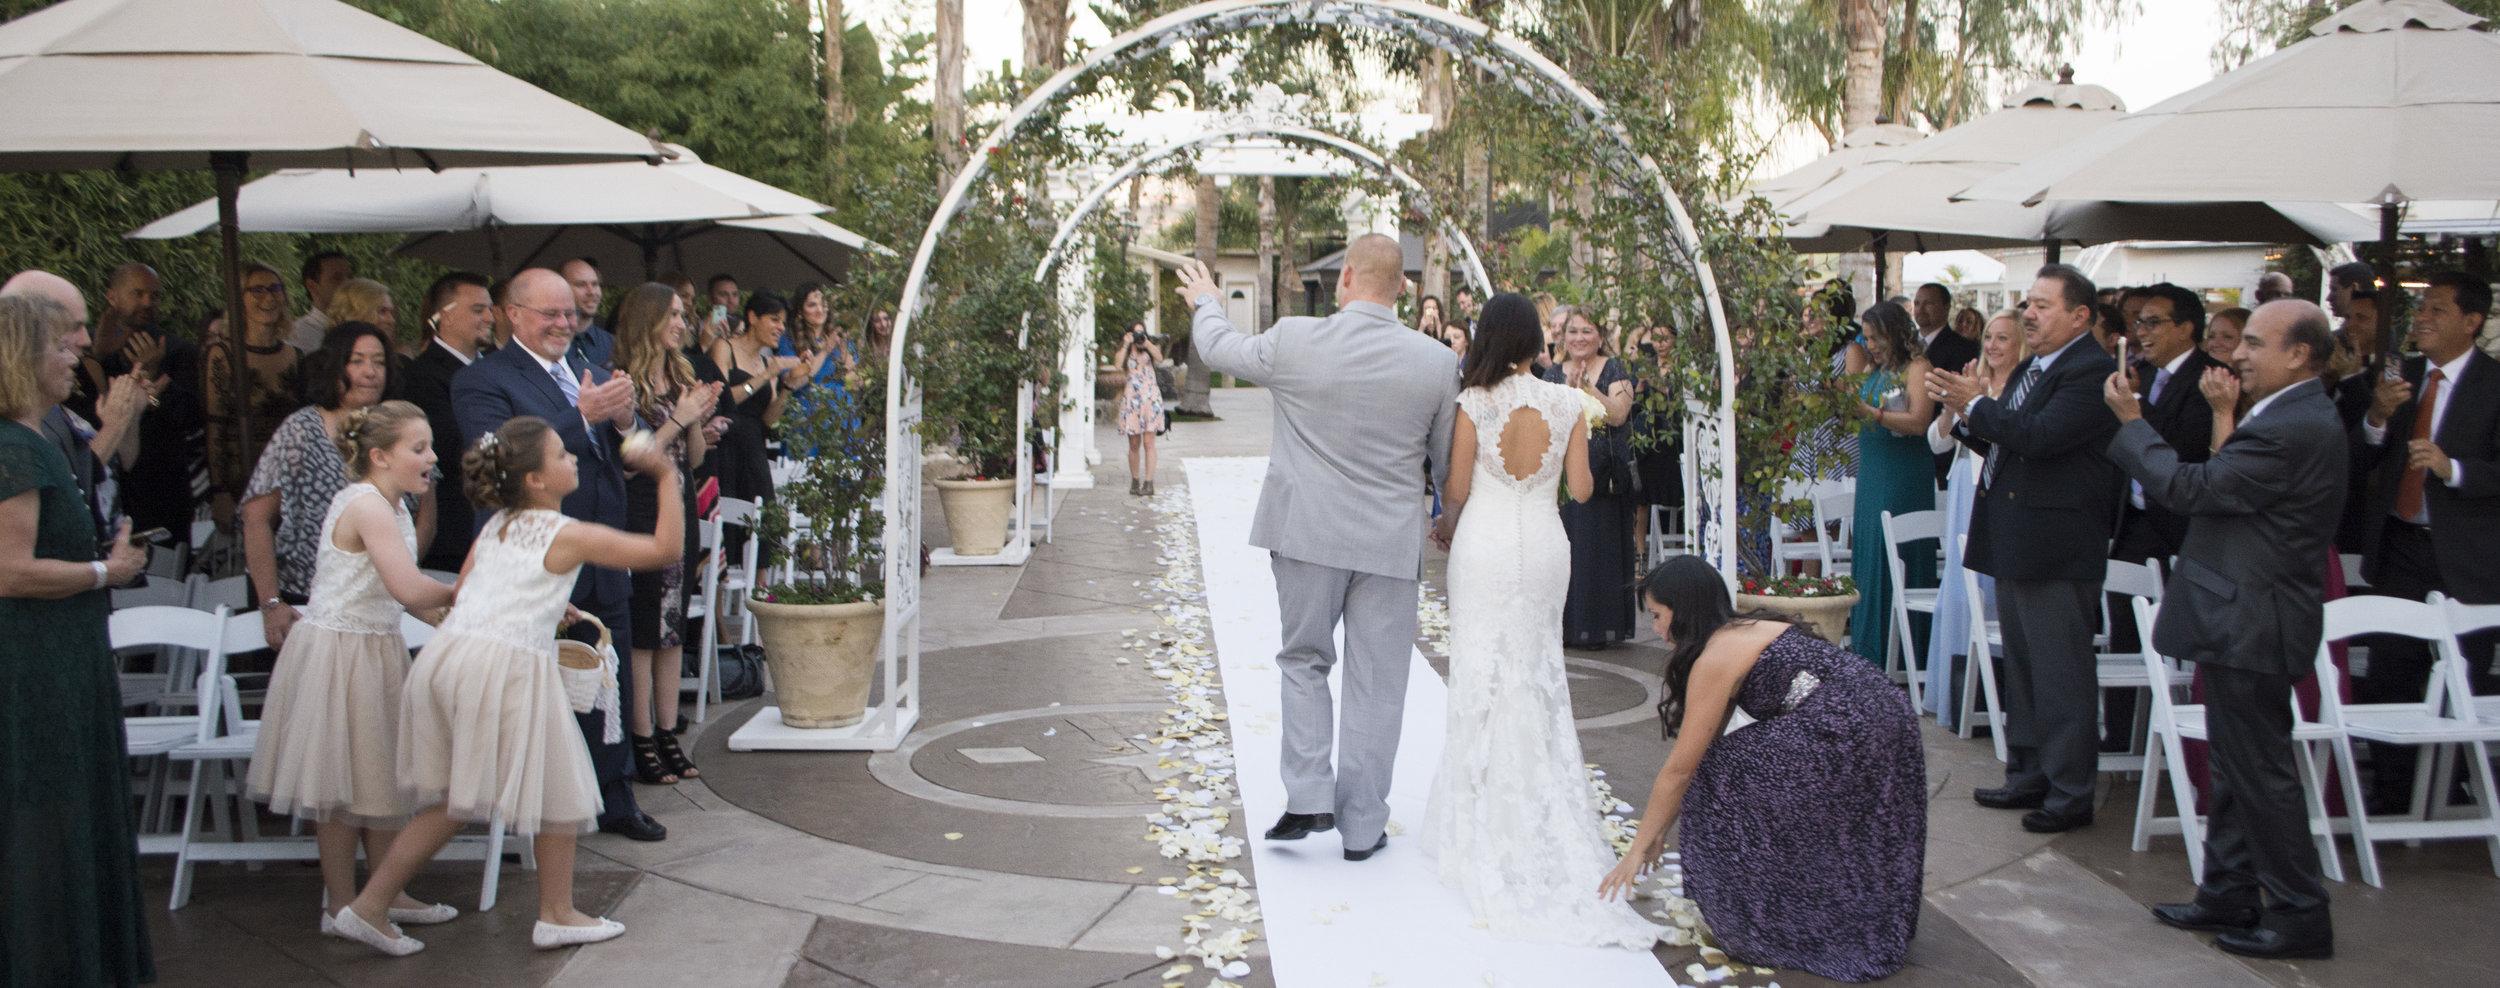 17_Rob_Wedding_Ceremony_153.jpg